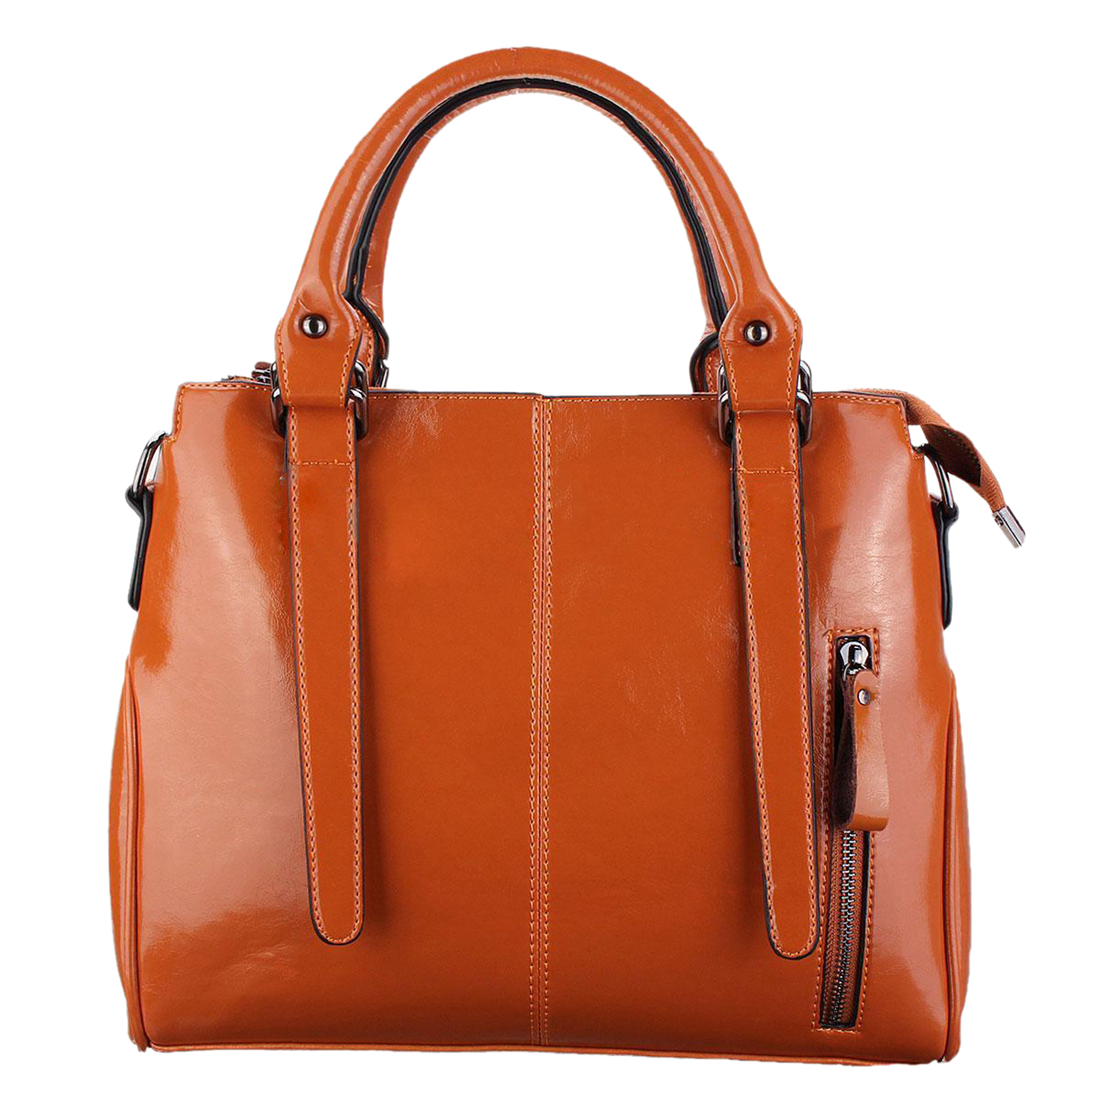 5 Pcs of (Women Leather Handbag Shoulder Bag Tote Messenger Crossbody Bag Ladies Satchel Purse Brown Convenient storage)